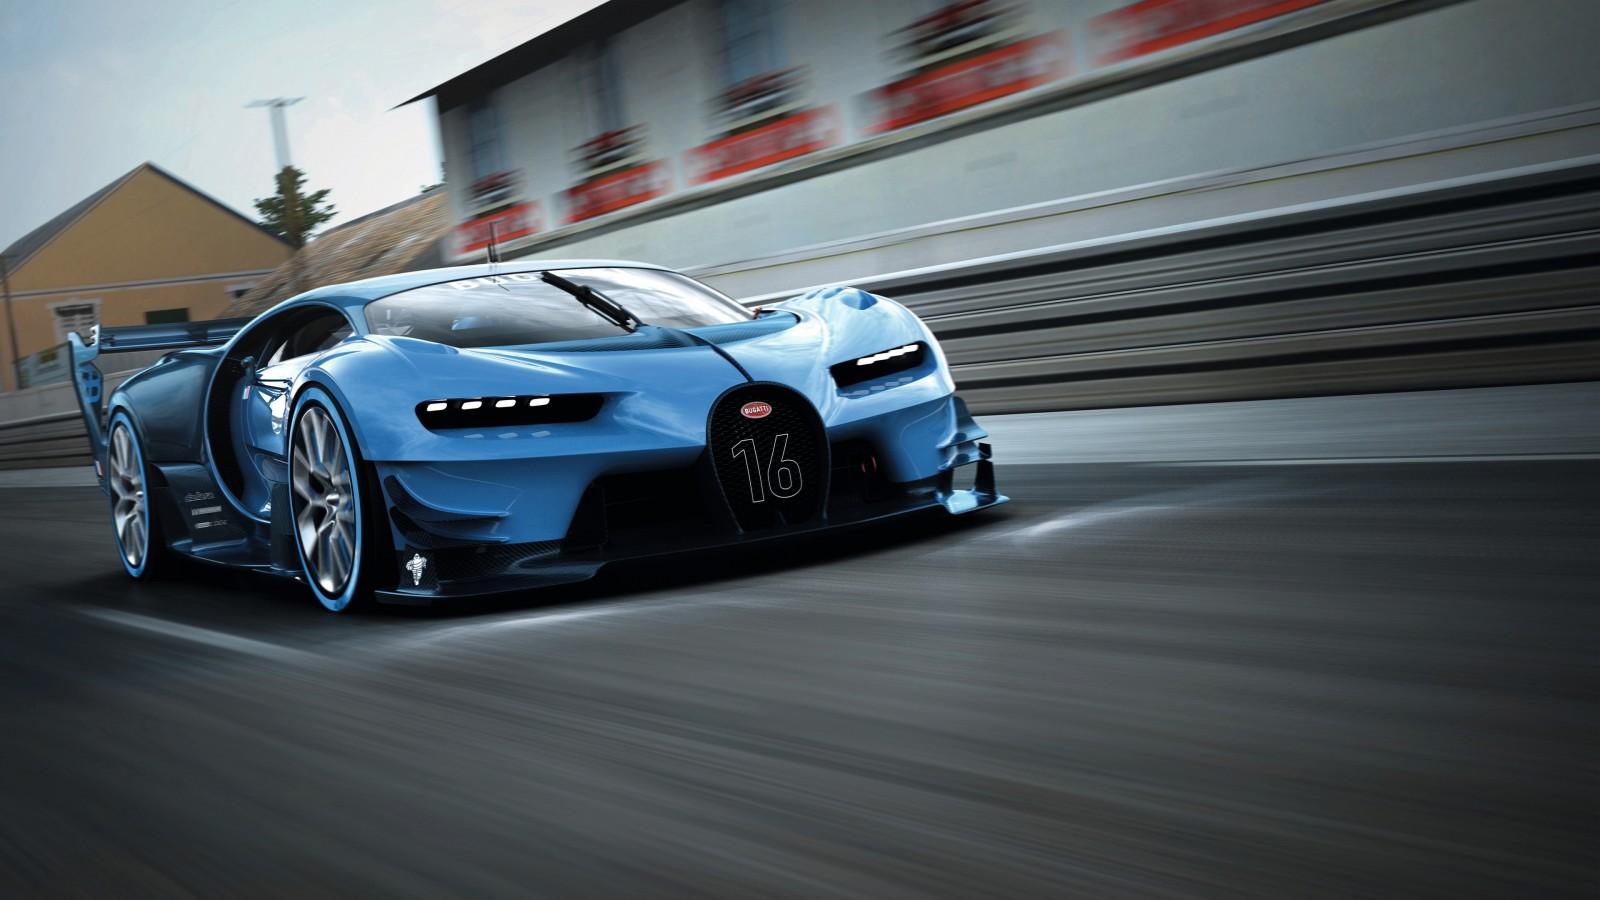 Car Wallpapers Hd 2015 Download Bugatti Vision Gran Turismo 2015 Wallpaper Hd Car